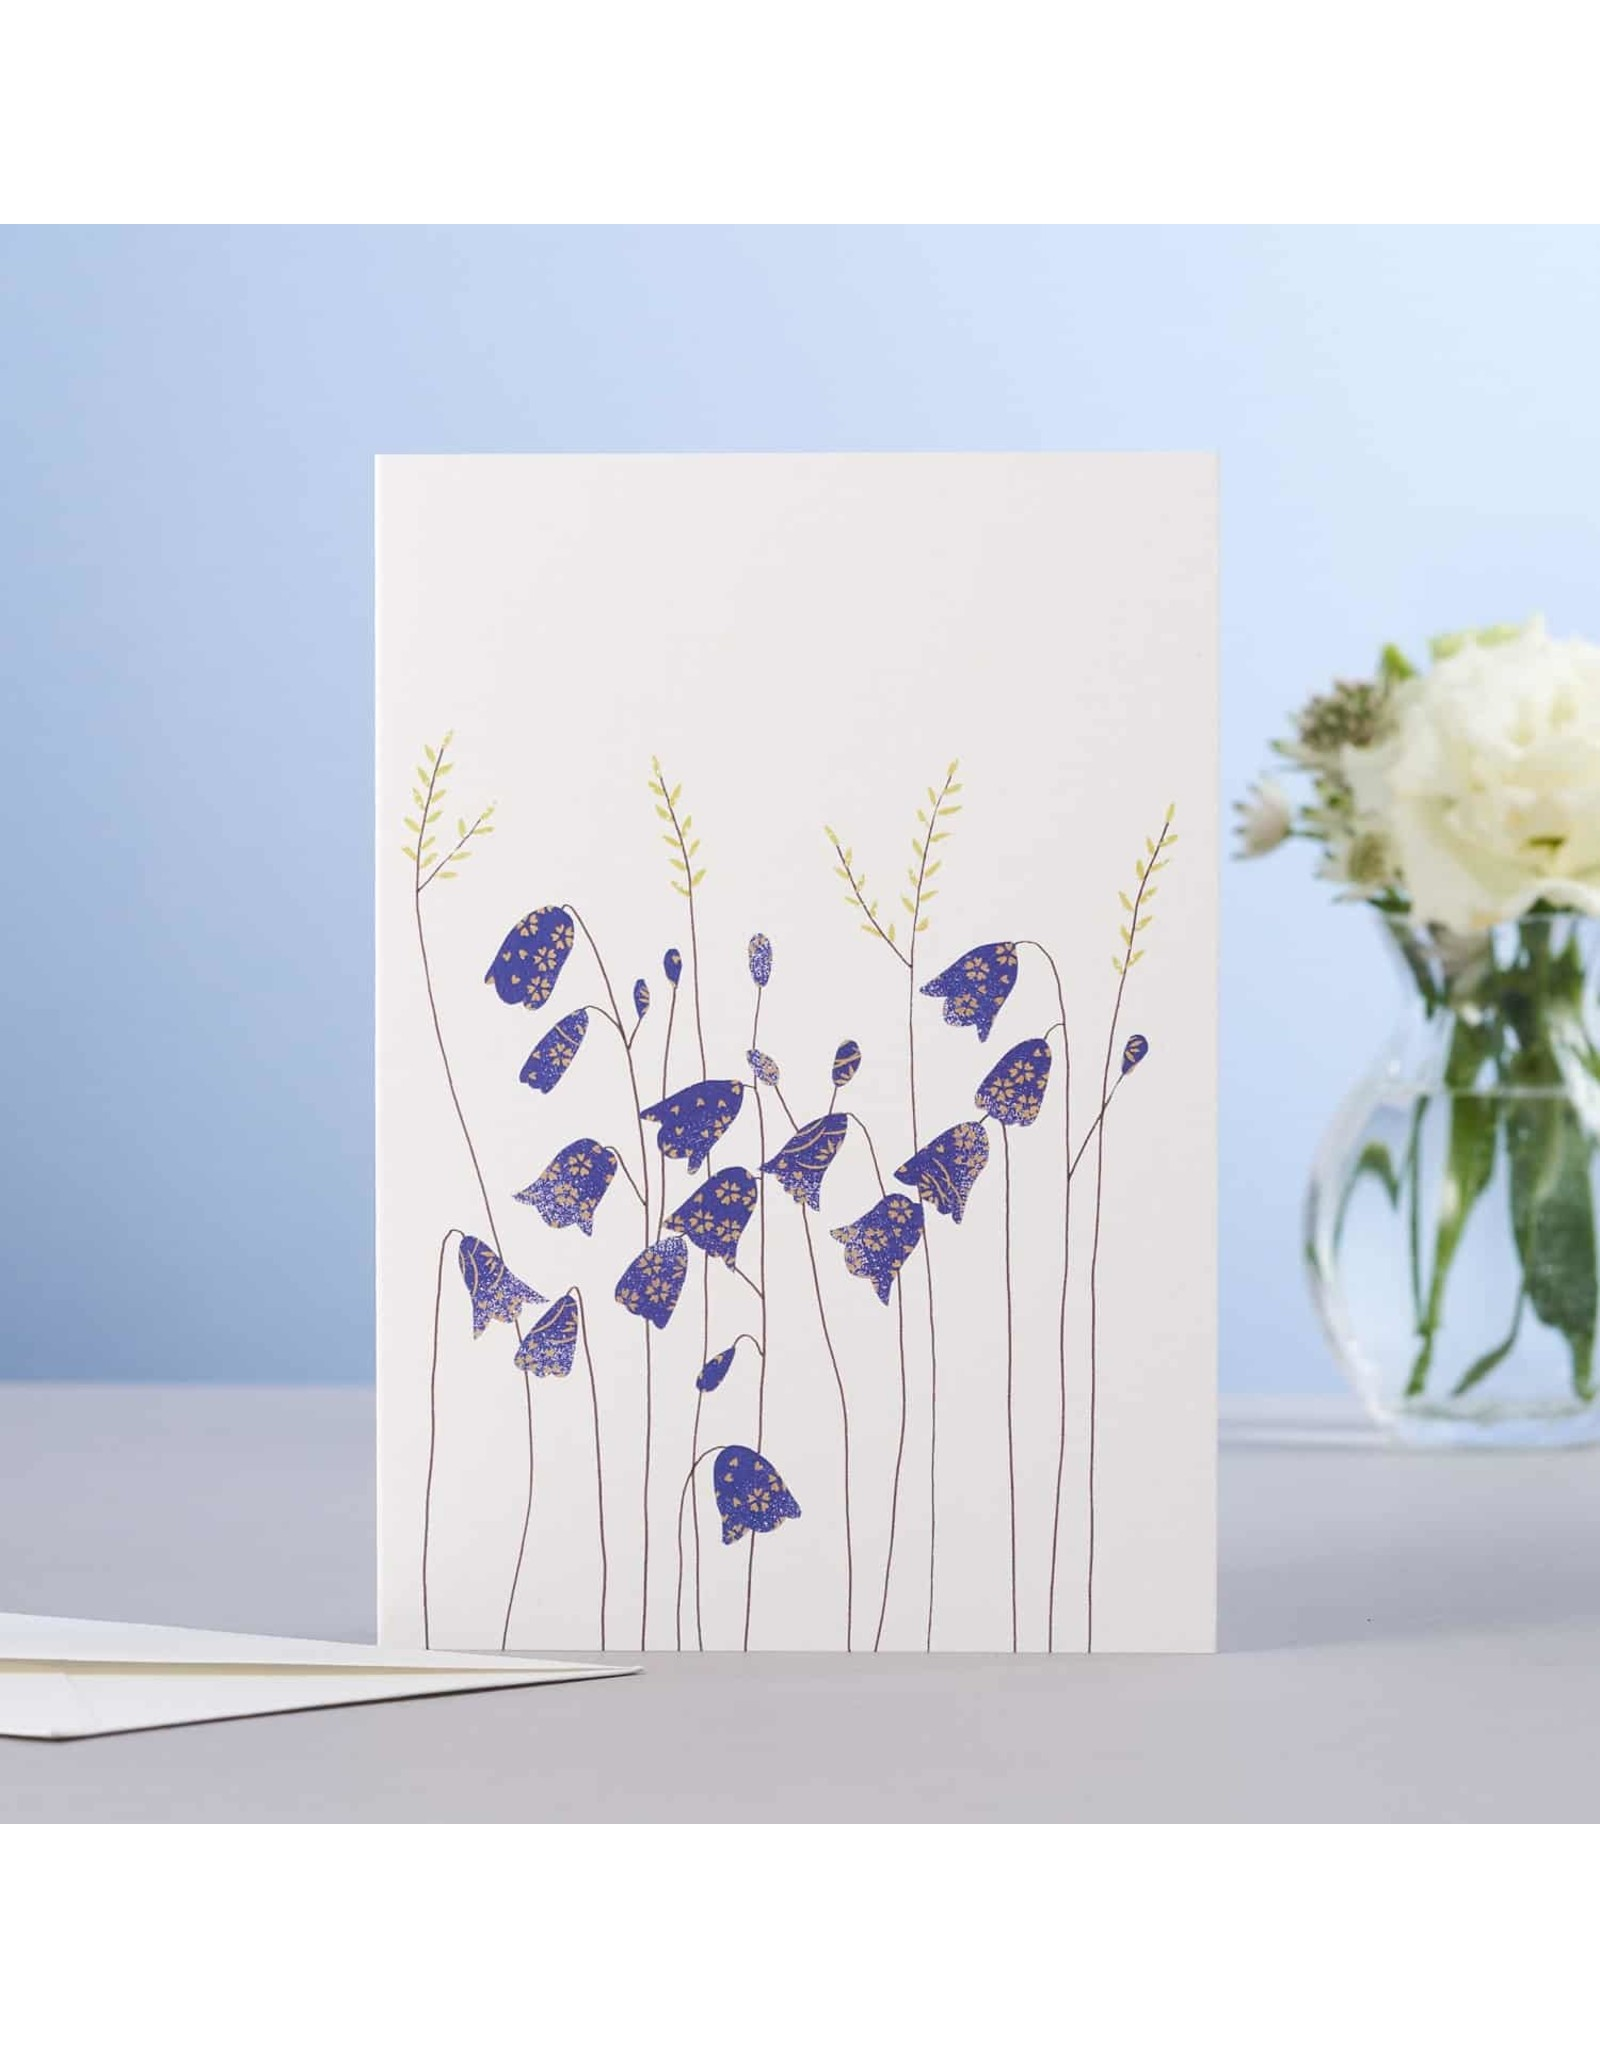 Eloise Halle Wenskaart - Harebells  & grass  - Dubbele Kaart + Envelop - 11,5 x 16,5 - Blanco